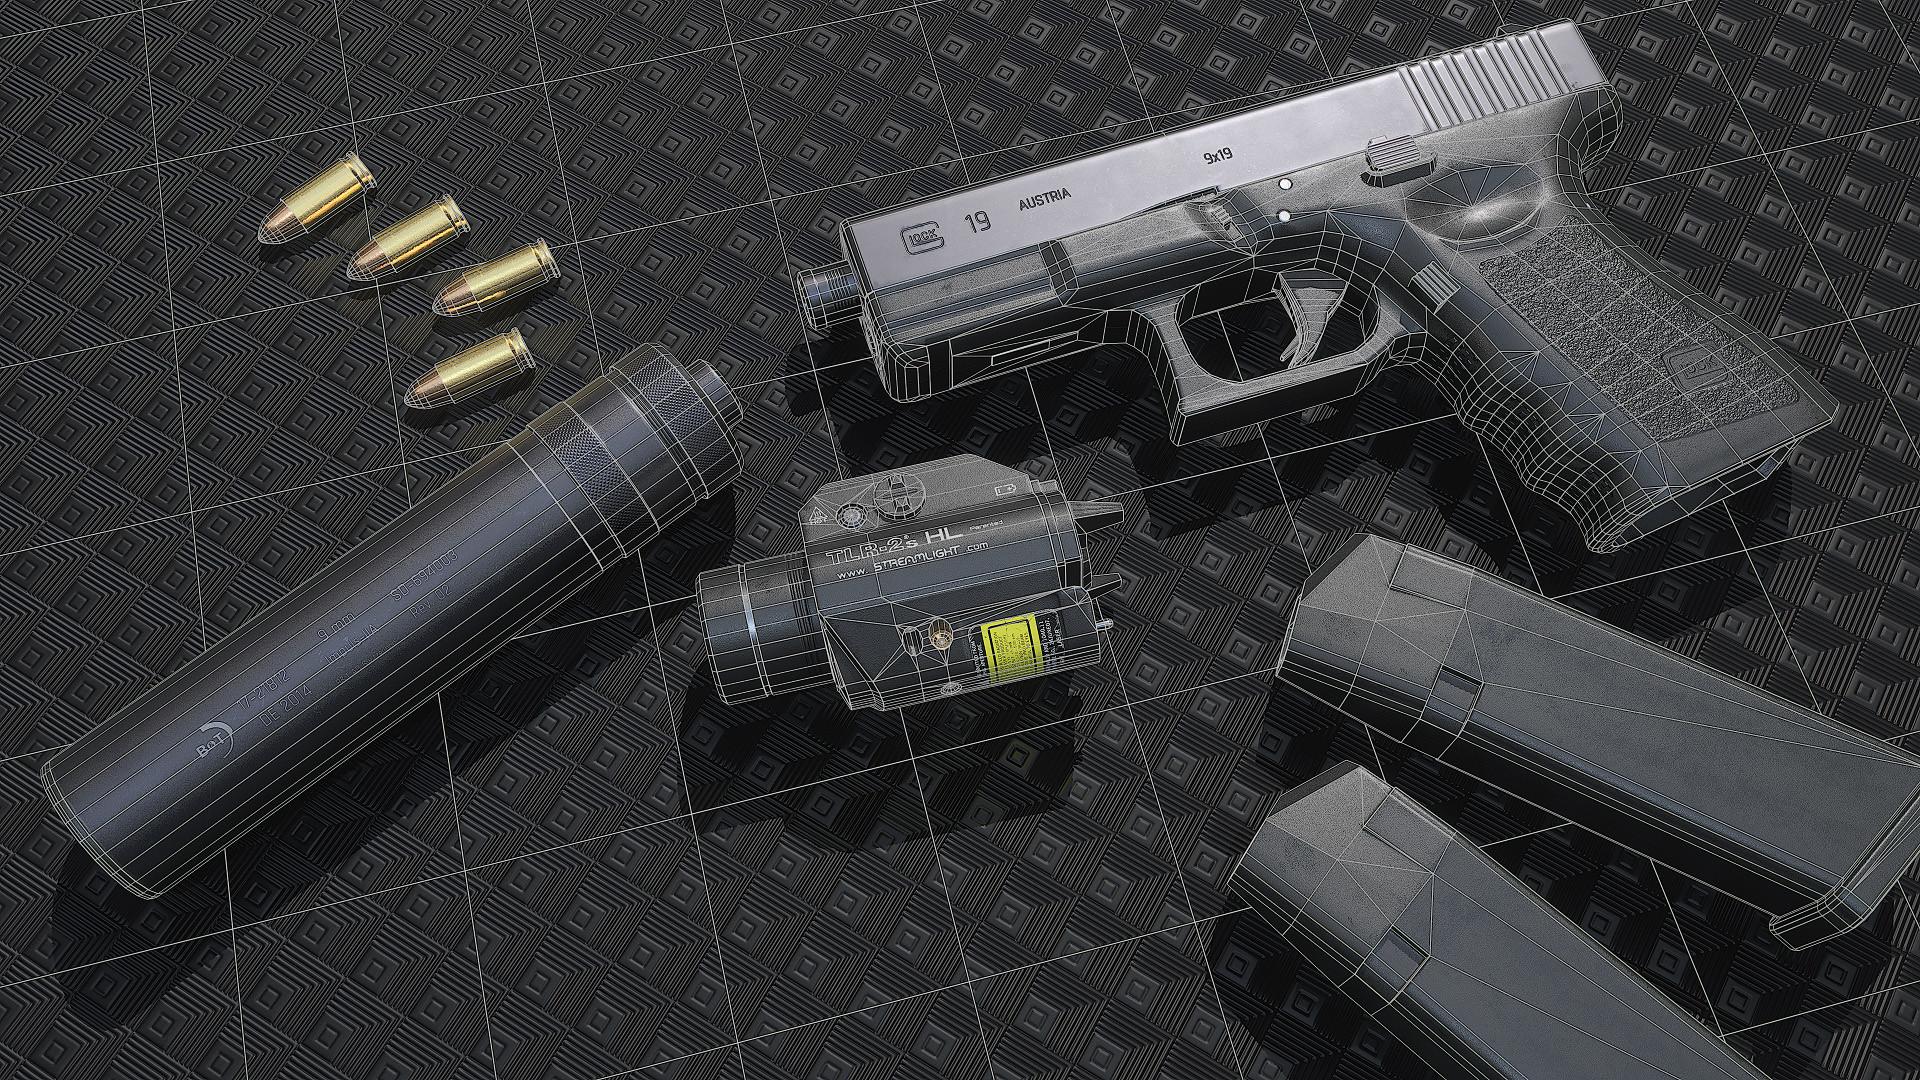 Keita tamura glock19 02